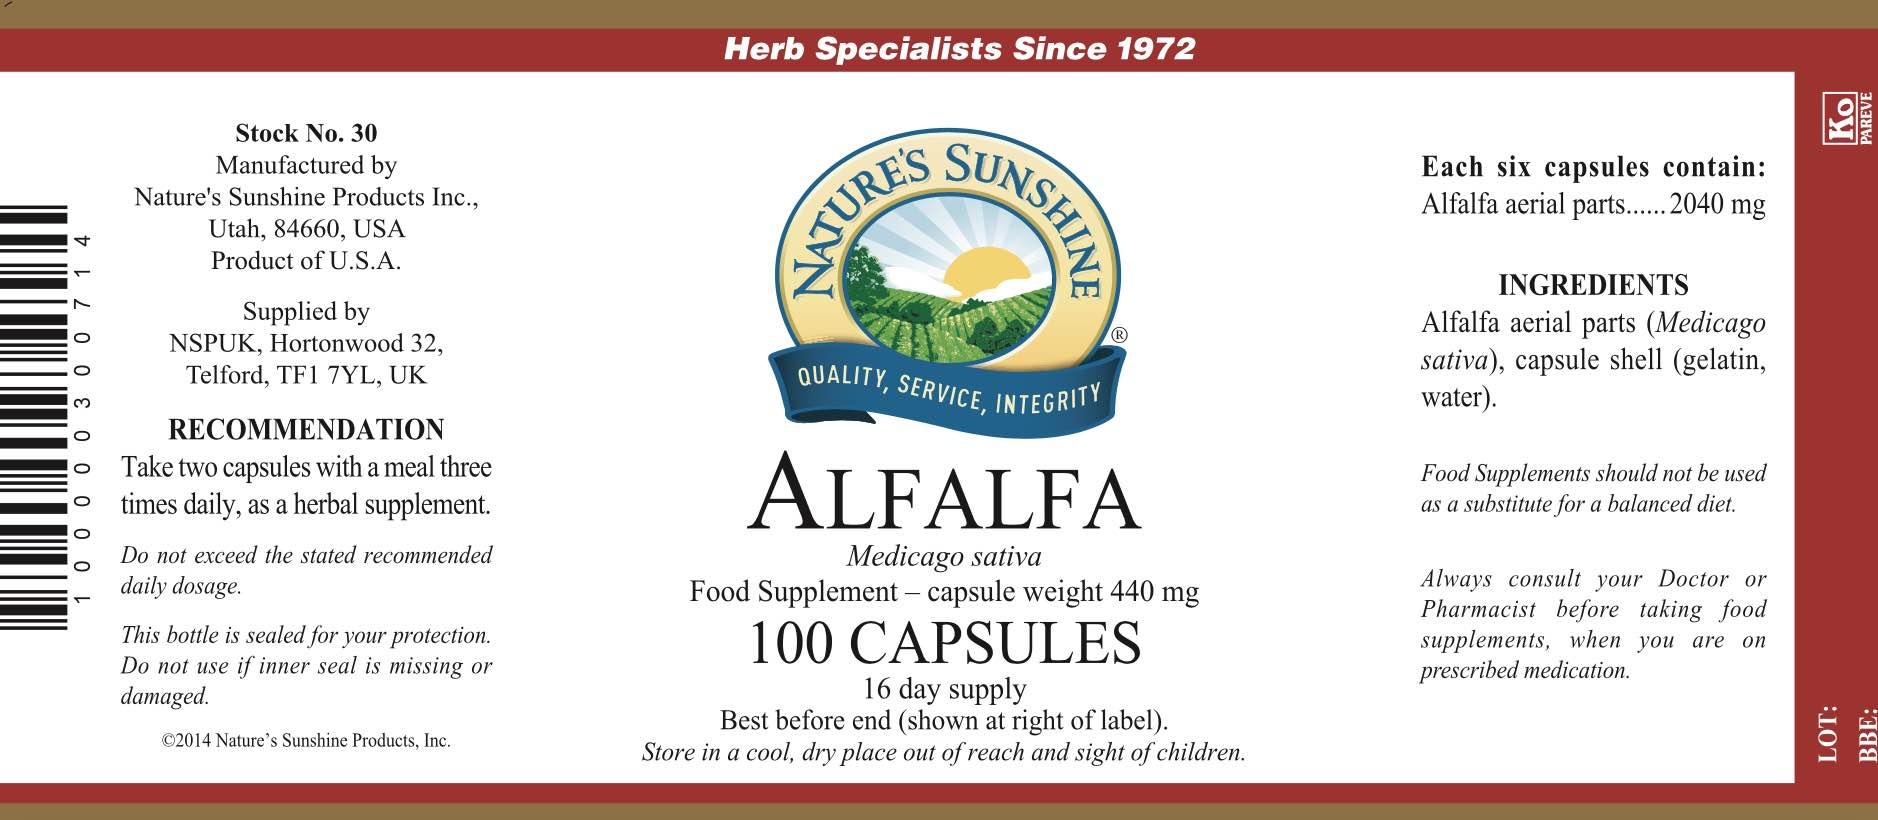 Nature's Sunshine - Alfalfa - Label